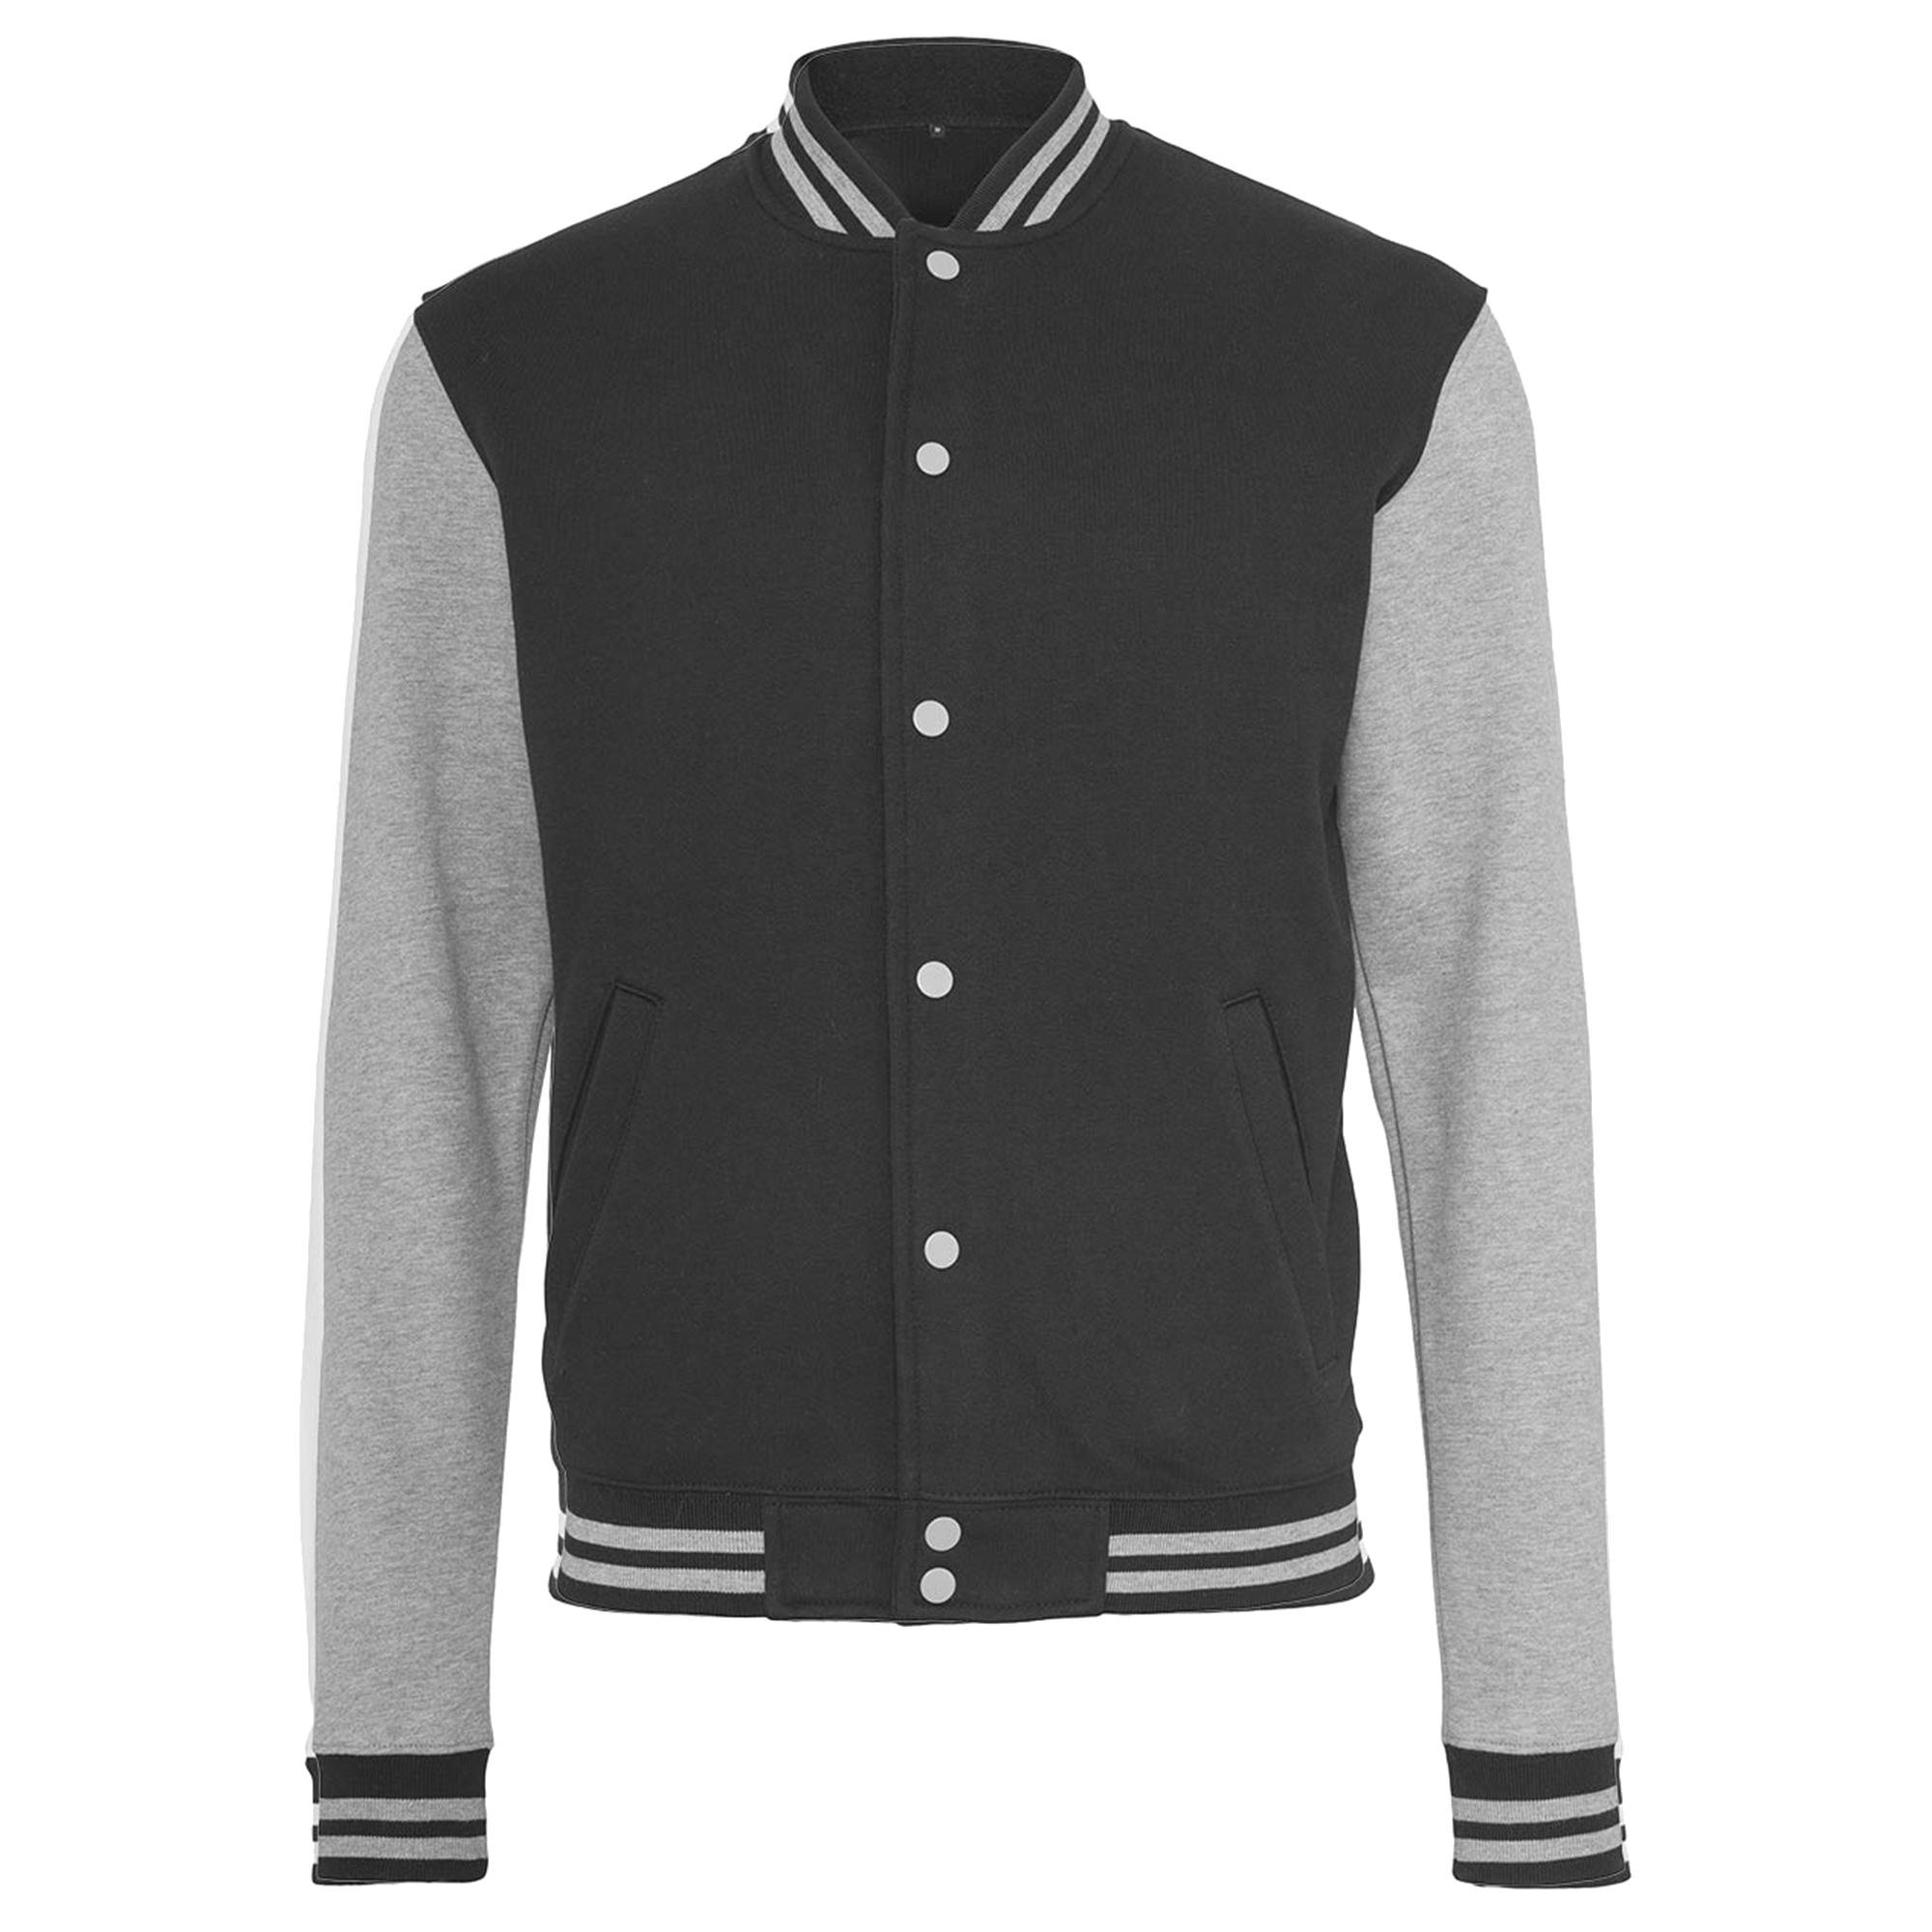 Build Your Brand Womens/Ladies Sweat College Jacket (XL) (Black/Heather Grey)